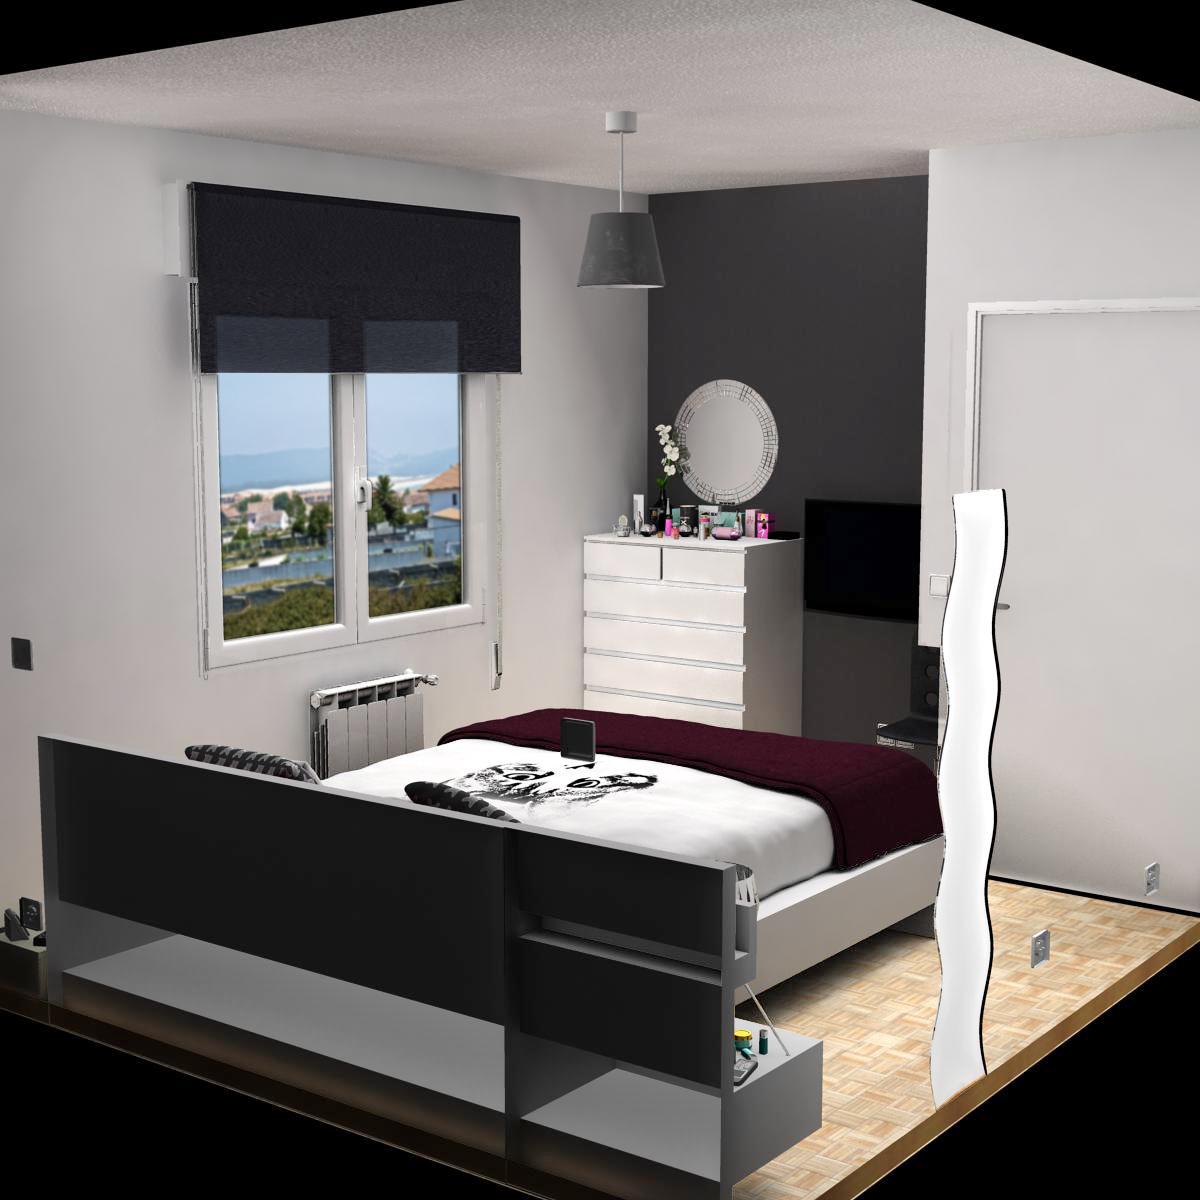 guļamistaba 8 3d modelis 3ds max fbx c4d ma mb obj 159563